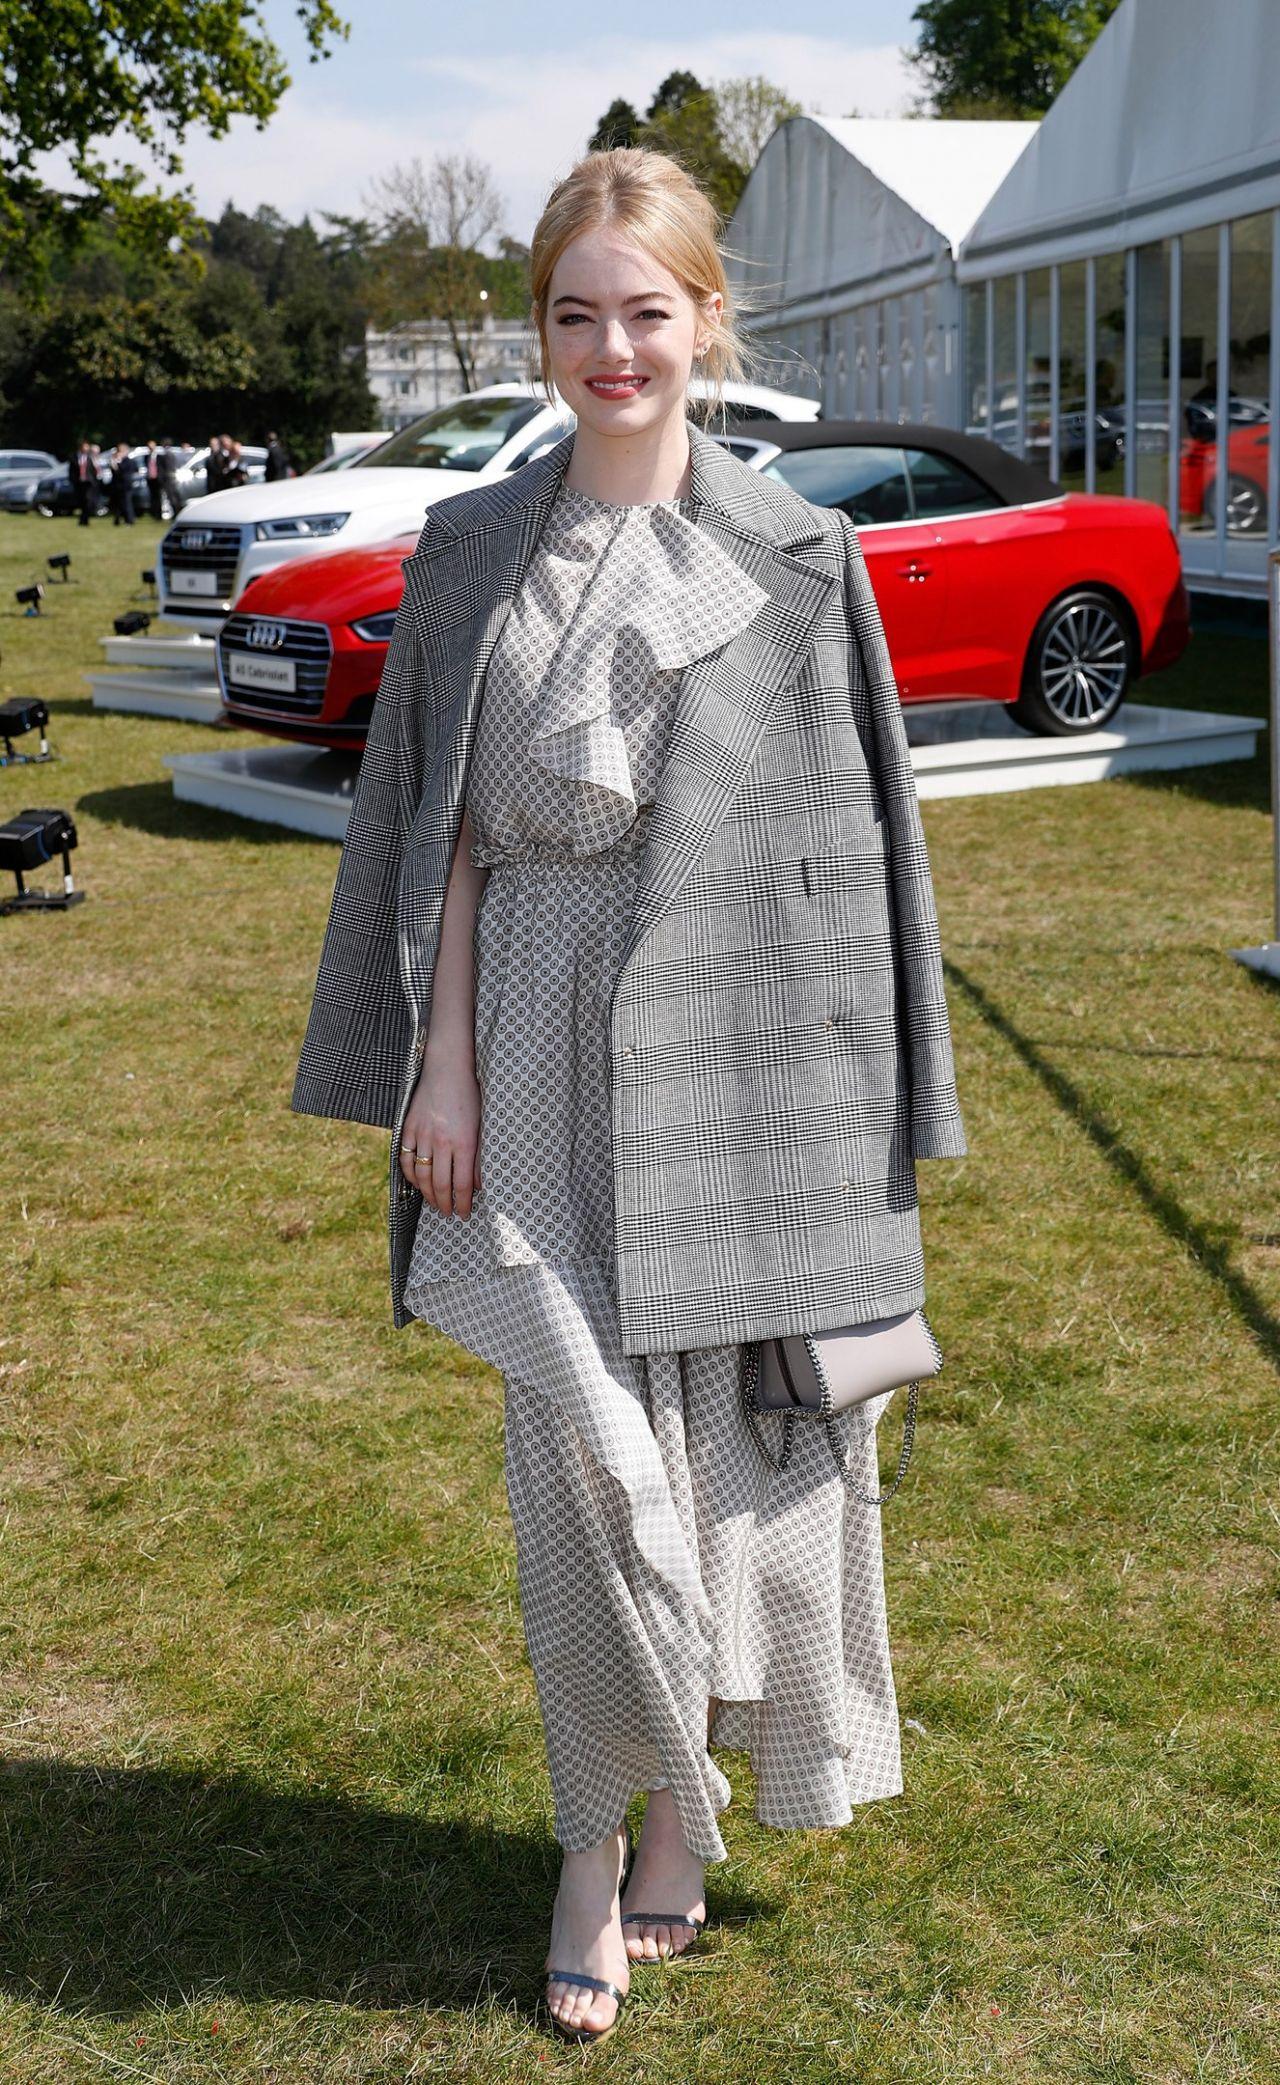 Emma Stone Audi Polo Challenge In Ascot England 05 07 2017